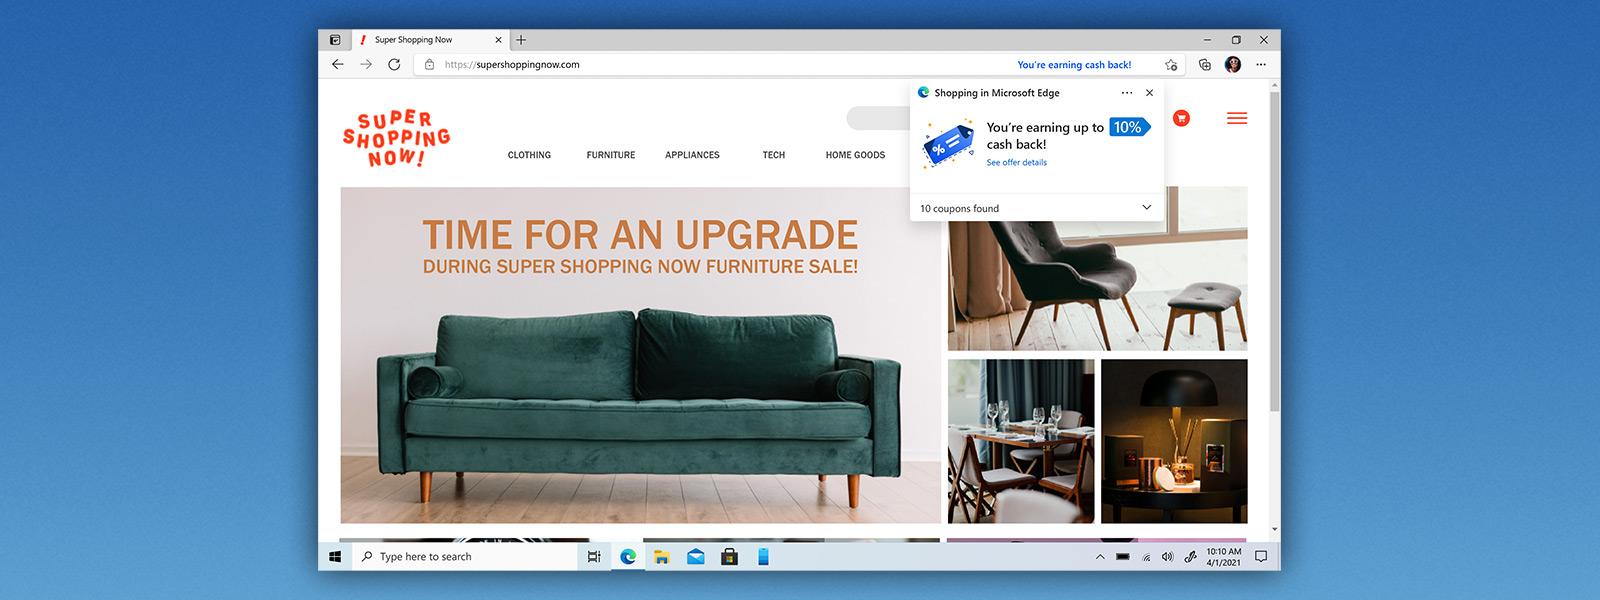 Microsoft Edge browser window showing shopping website with Bing rebates